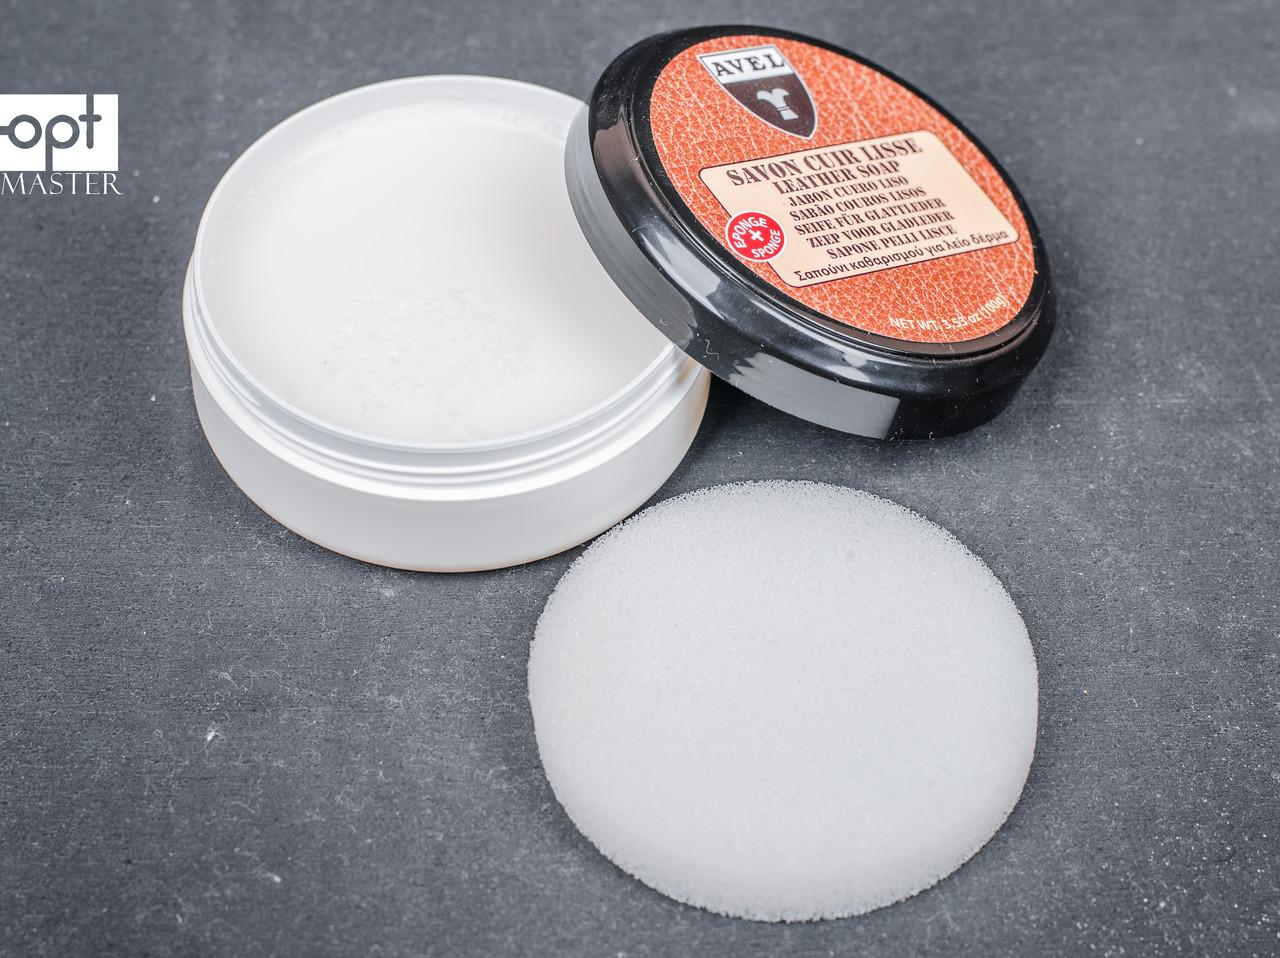 Очищающее мыло Avel Savon Cuir Lisse Leather Soap, цв. бесцветный, 100 мл (4000)